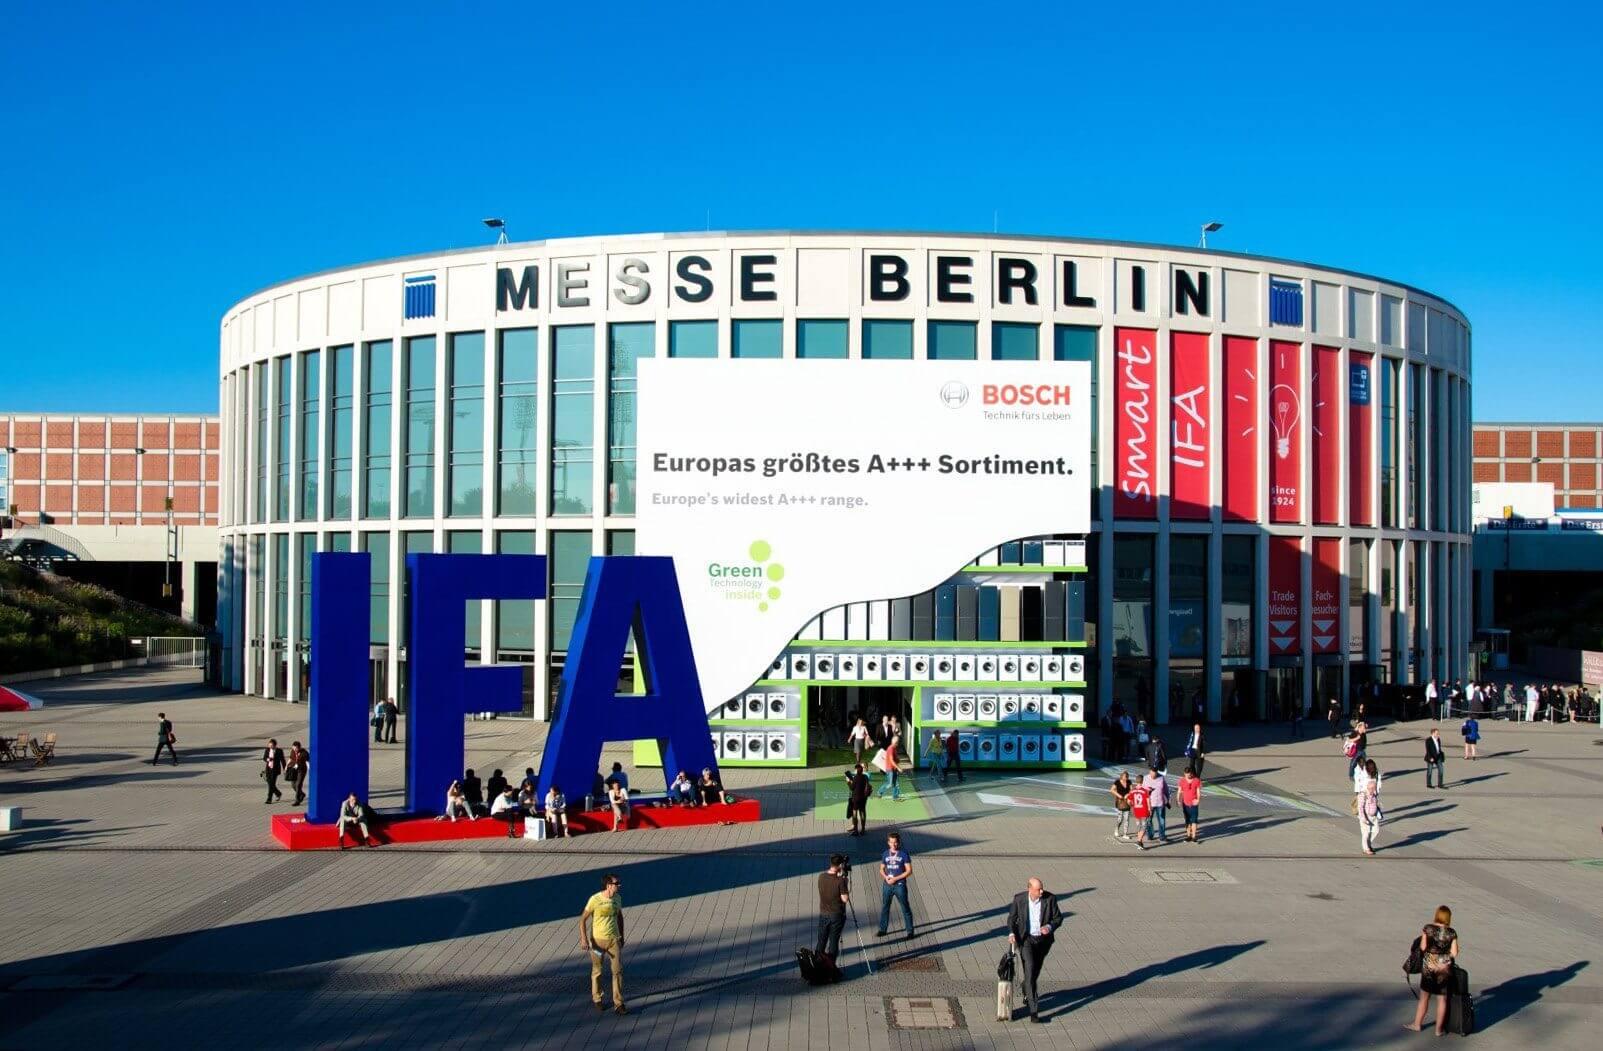 IFA Berlim Internationale Funkausstellung Berlin tecnologia feira